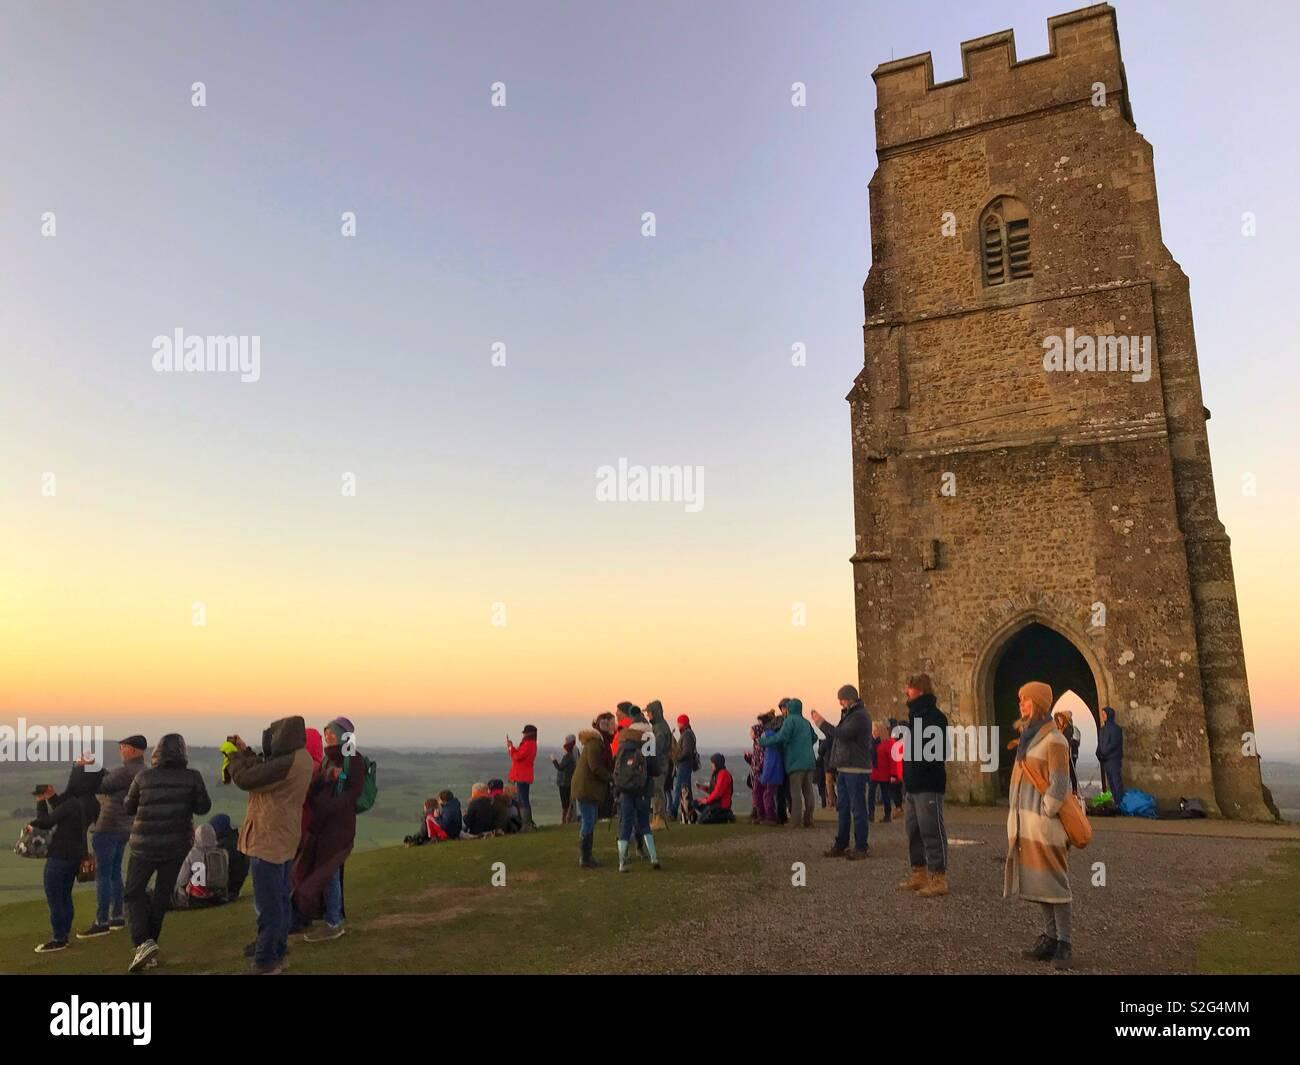 Watching sunrise on New Years Day 2019 at Glastonbury Tor, Somerset - Stock Image